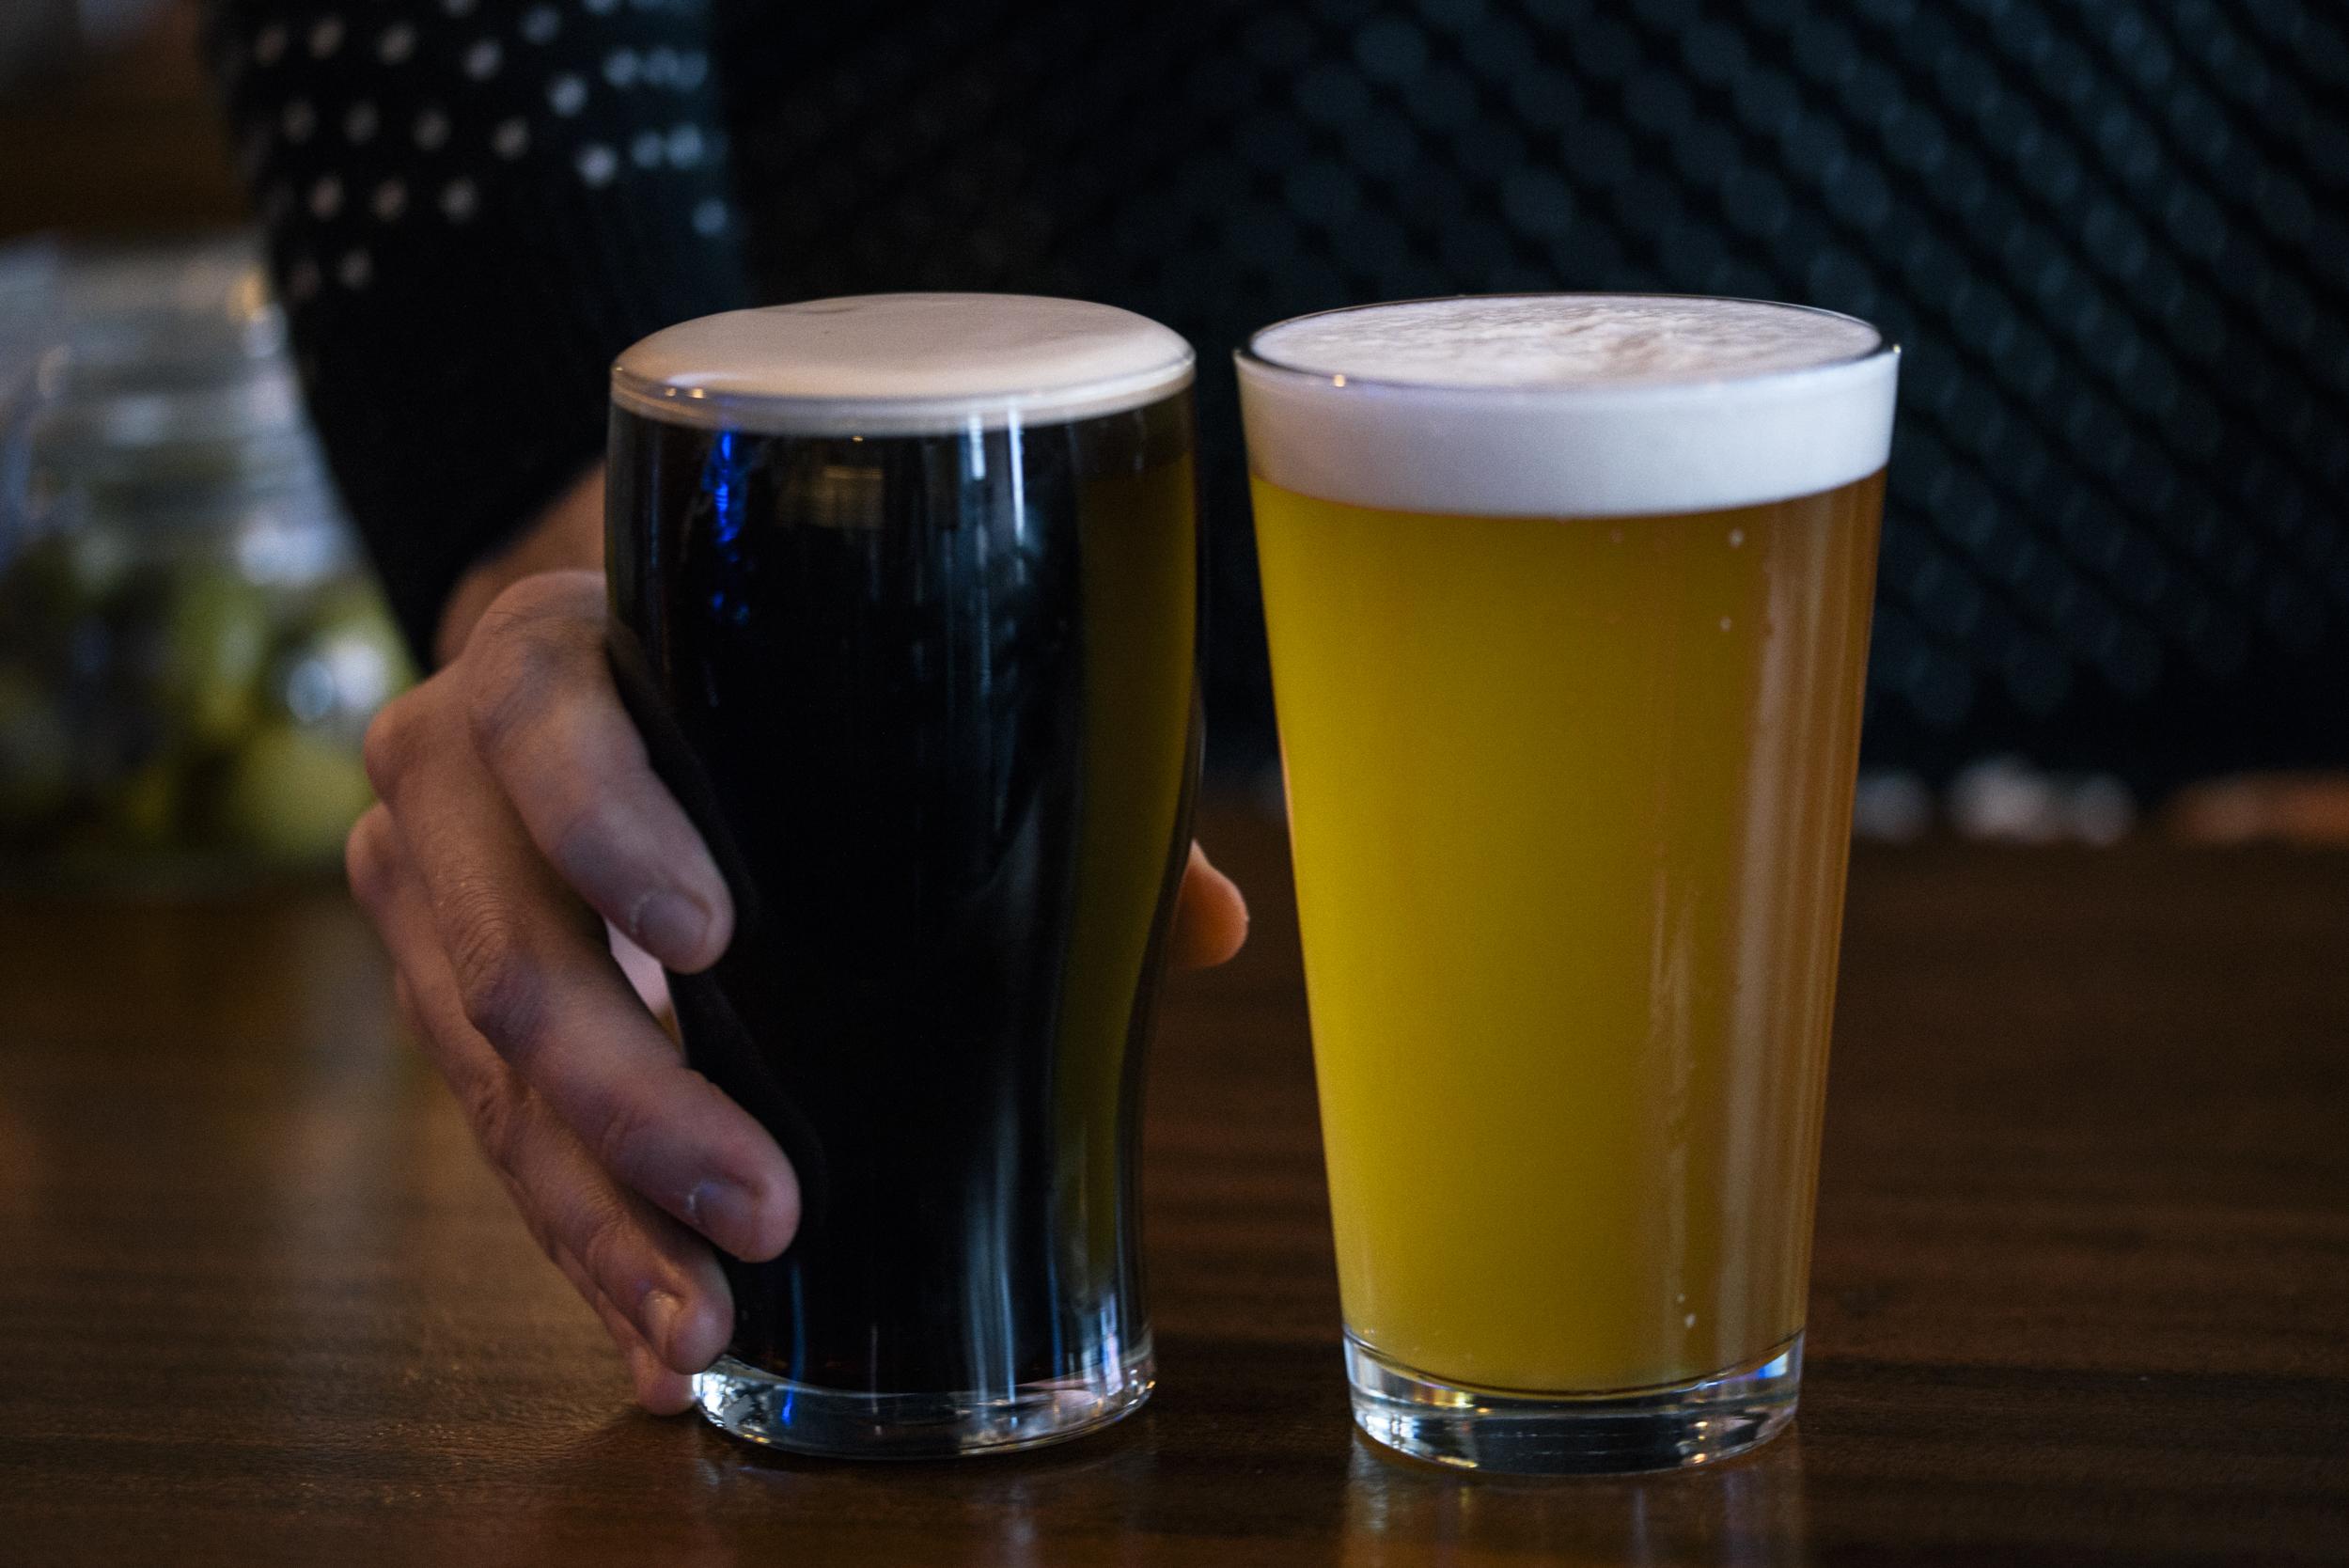 two pints of draft beer in pint glasses, one dark beer and one light beer